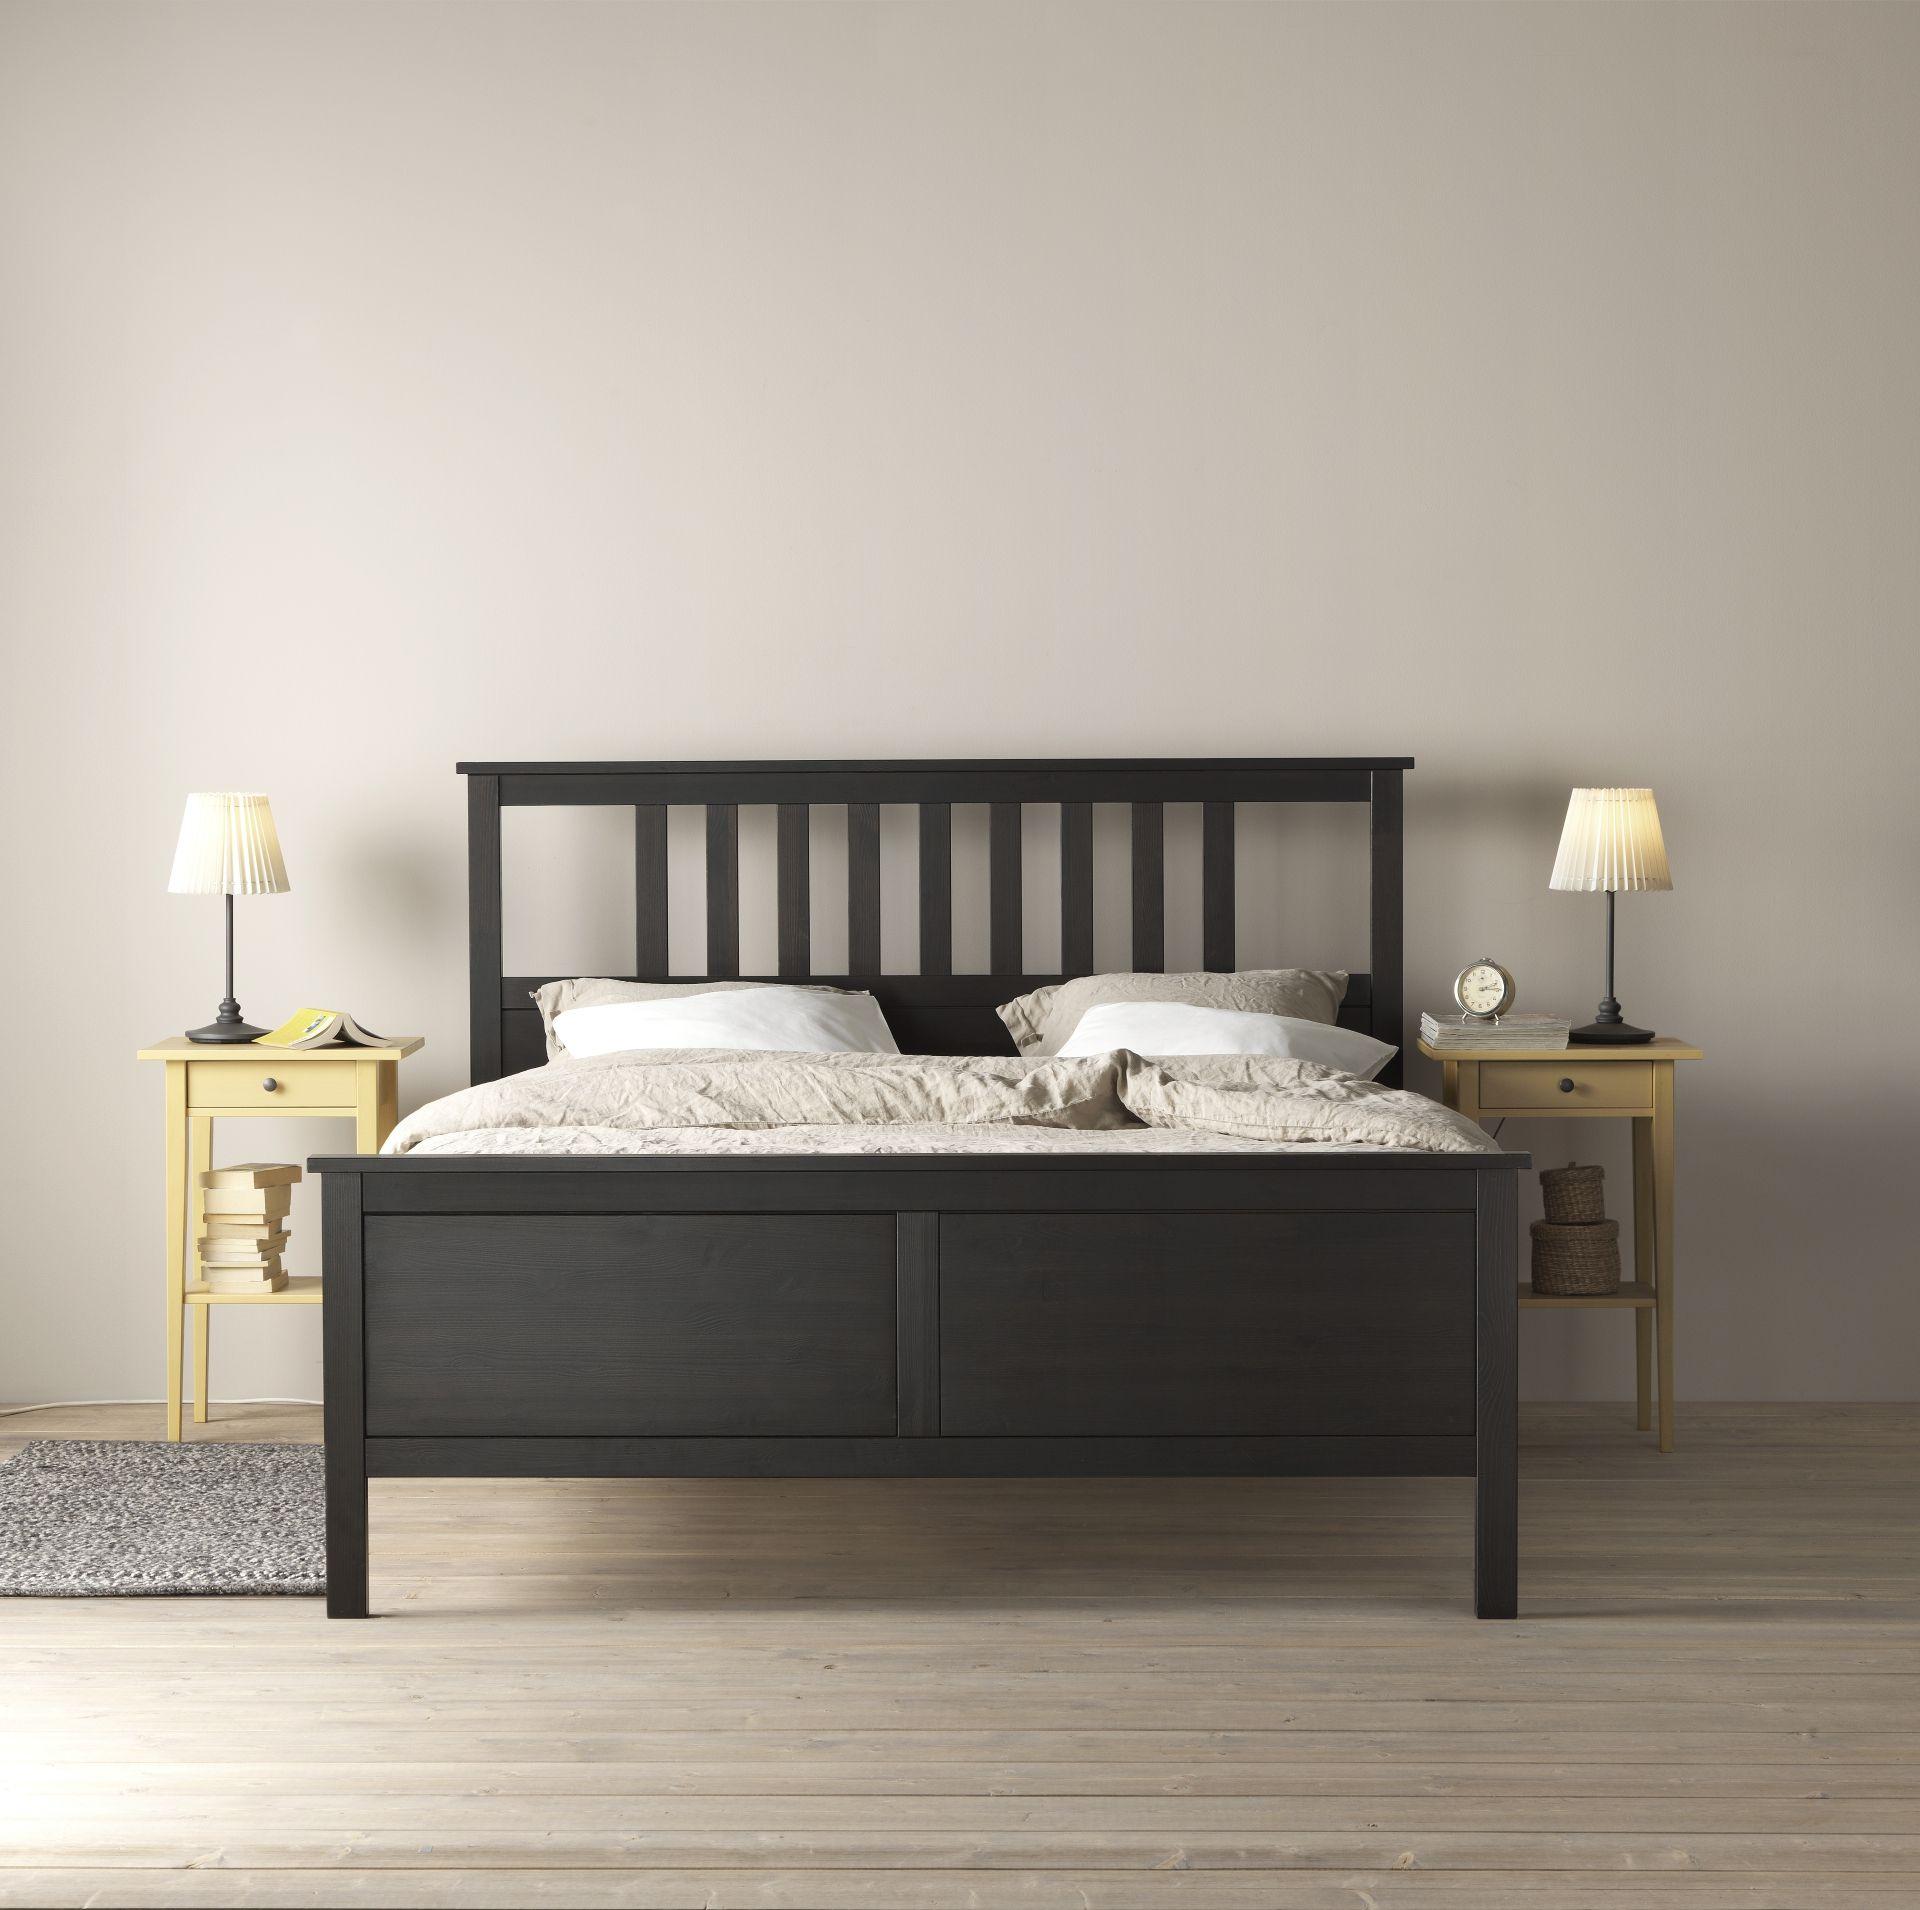 Hemnes Bedframe, Zwartbruin, Leirsund Hemnesikeabedroom Ideasikea Ikea